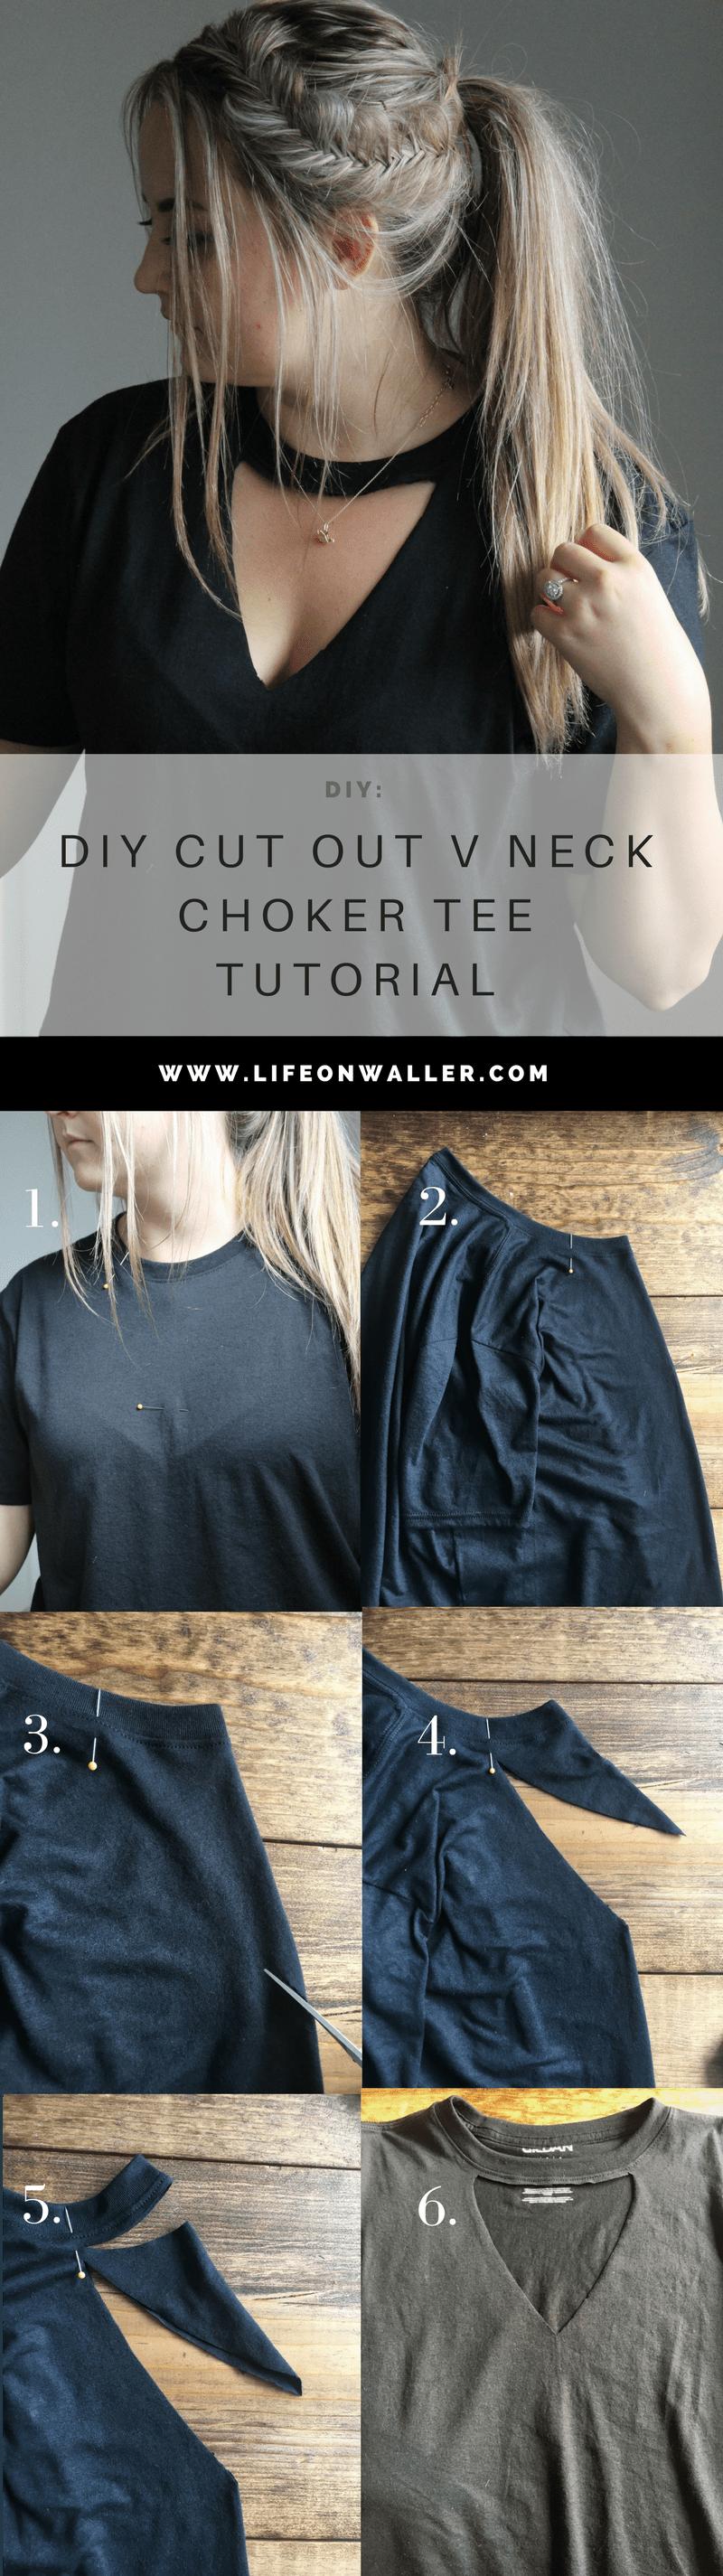 diy cut out v neck choker tee tutorial